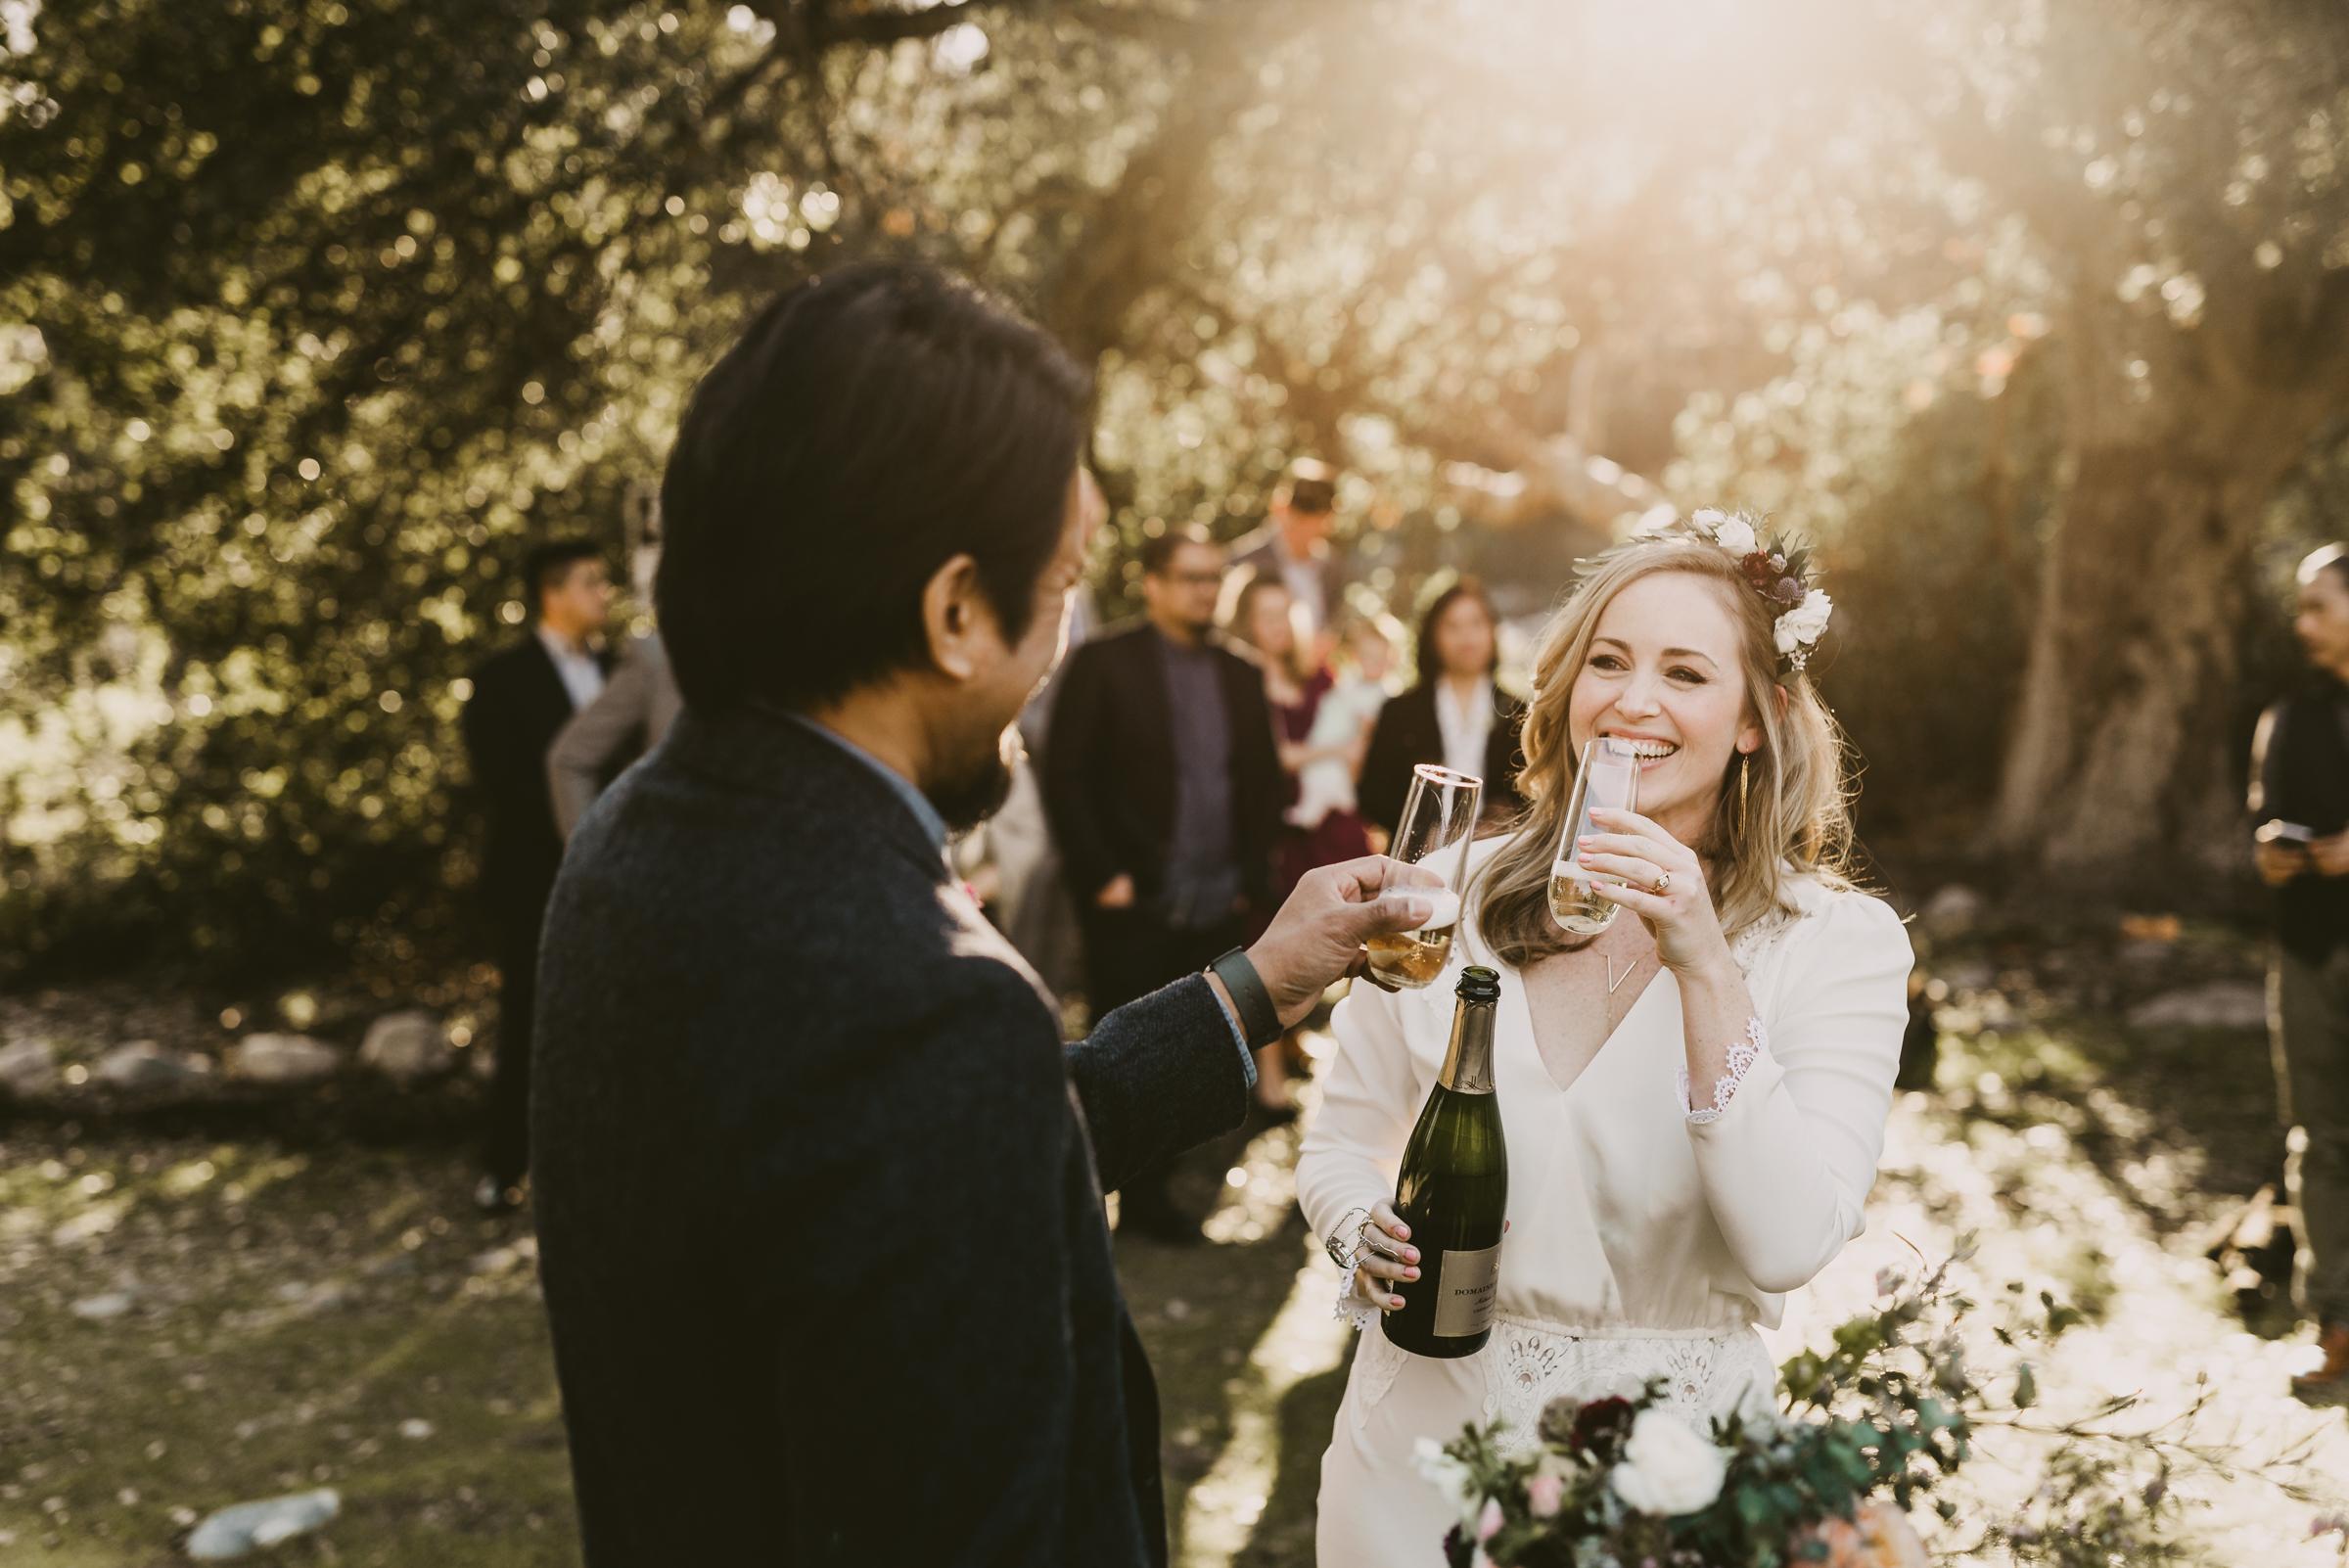 ©Isaiah + Taylor Photography - Intimate Elopement, Eaton Canyon, Los Angeles Wedding Photographer-46.jpg